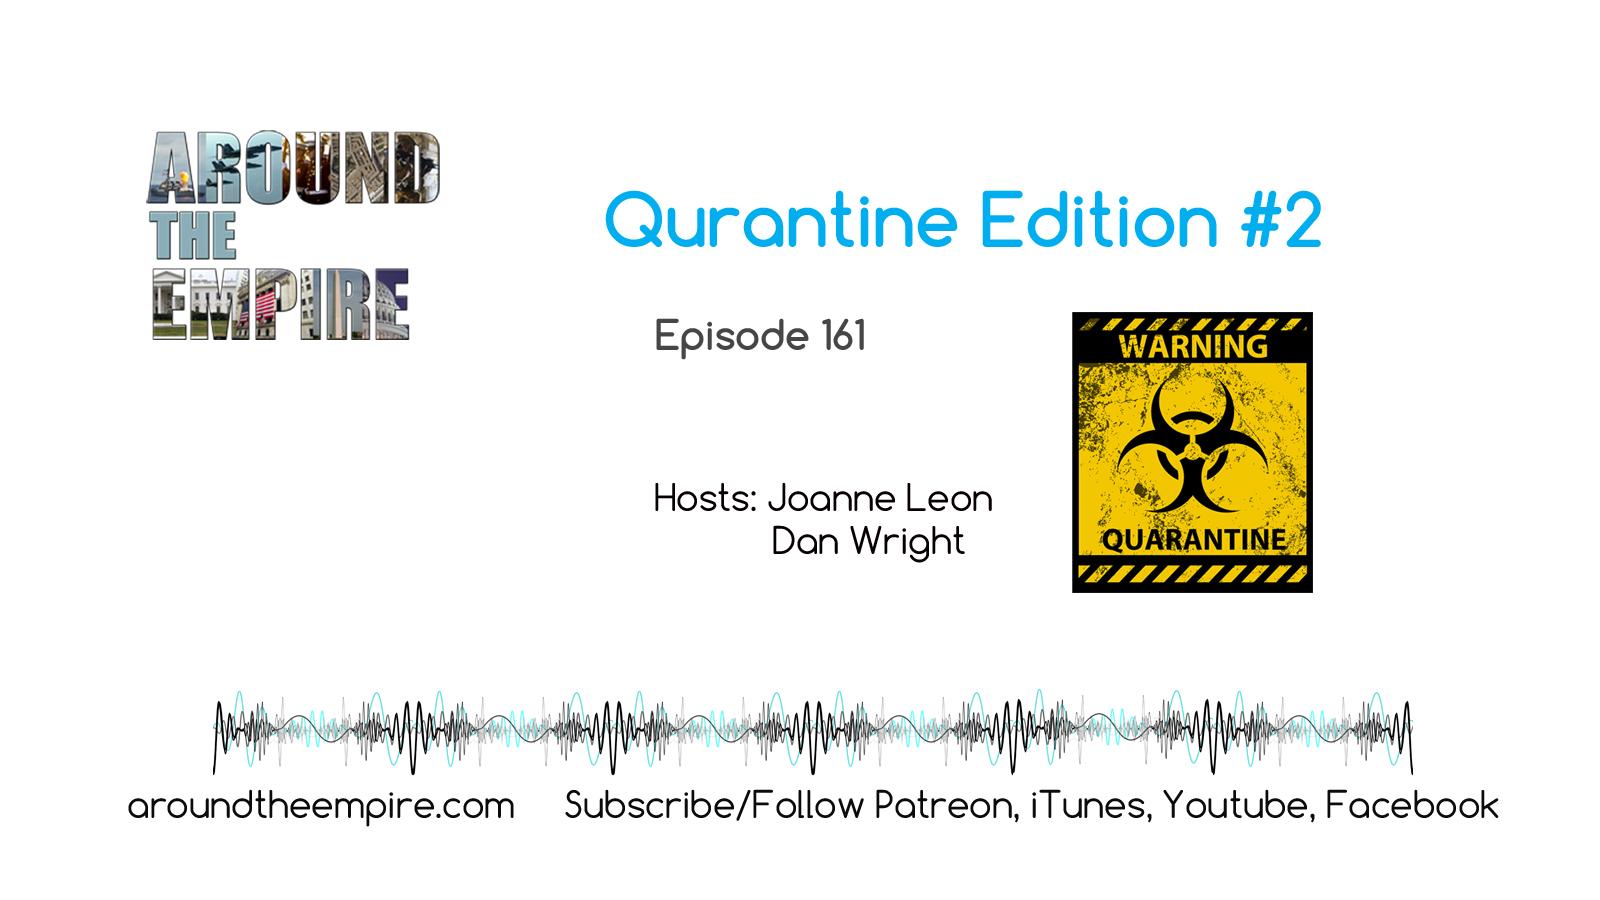 Ep 161 UNLOCKED Quarantine Edition 2